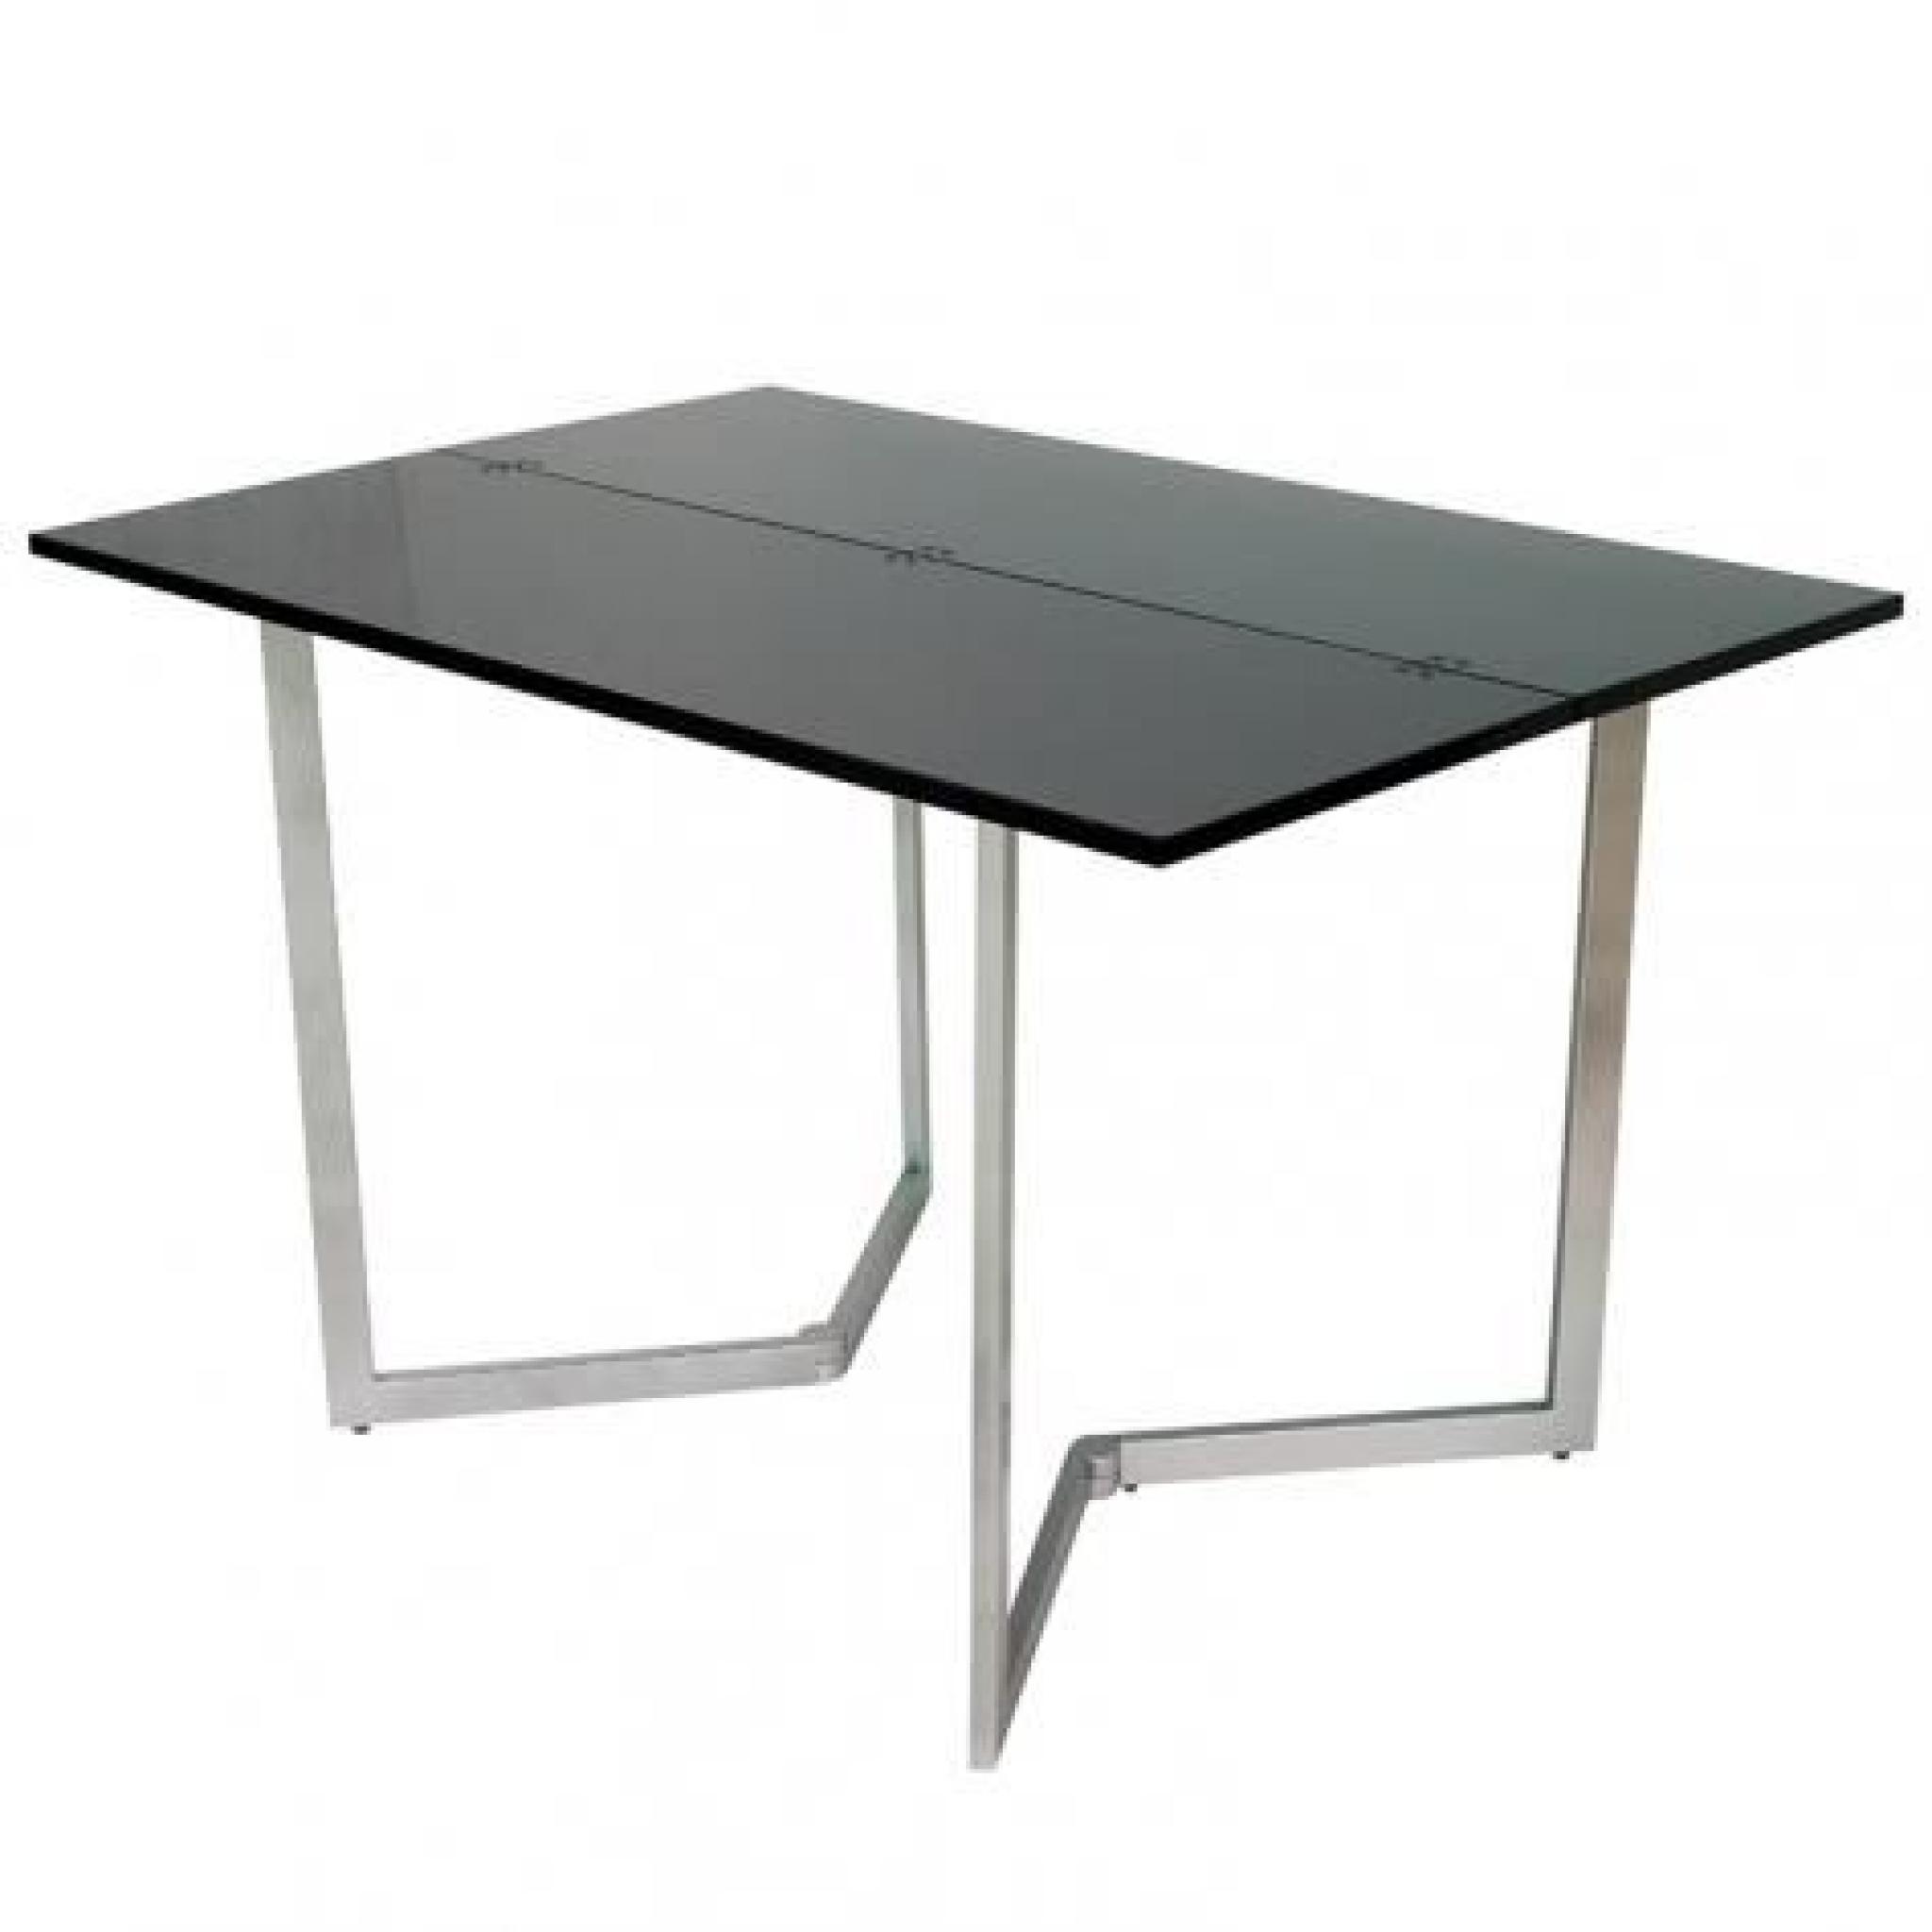 table console mural extensible noir xena achat vente. Black Bedroom Furniture Sets. Home Design Ideas